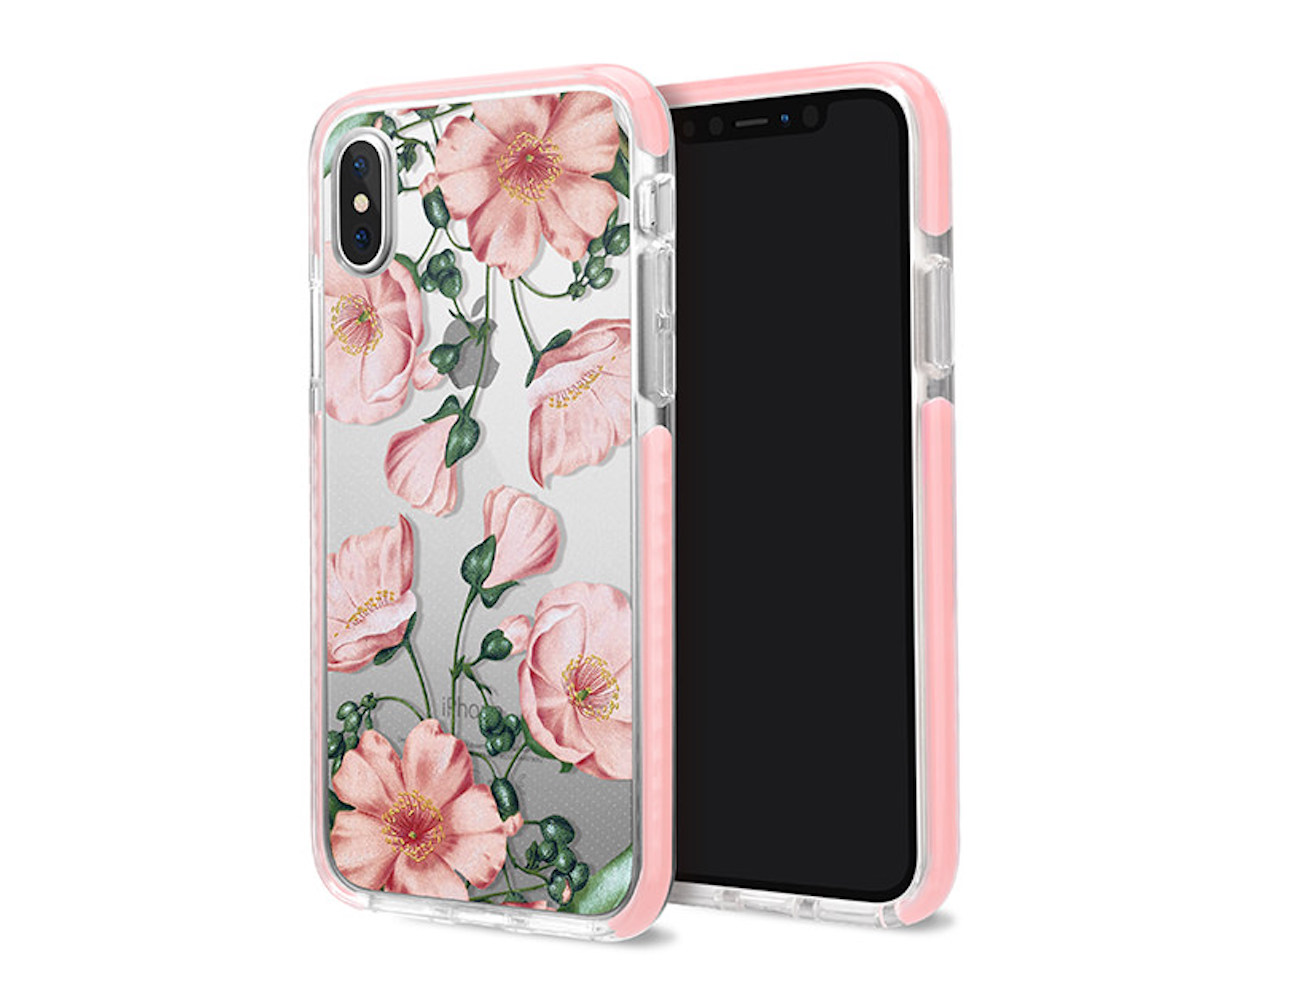 Iphonex Phone Cases: 【iPhoneXケース特集】おすすめの人気iPhone X用ケース・カバーまとめ